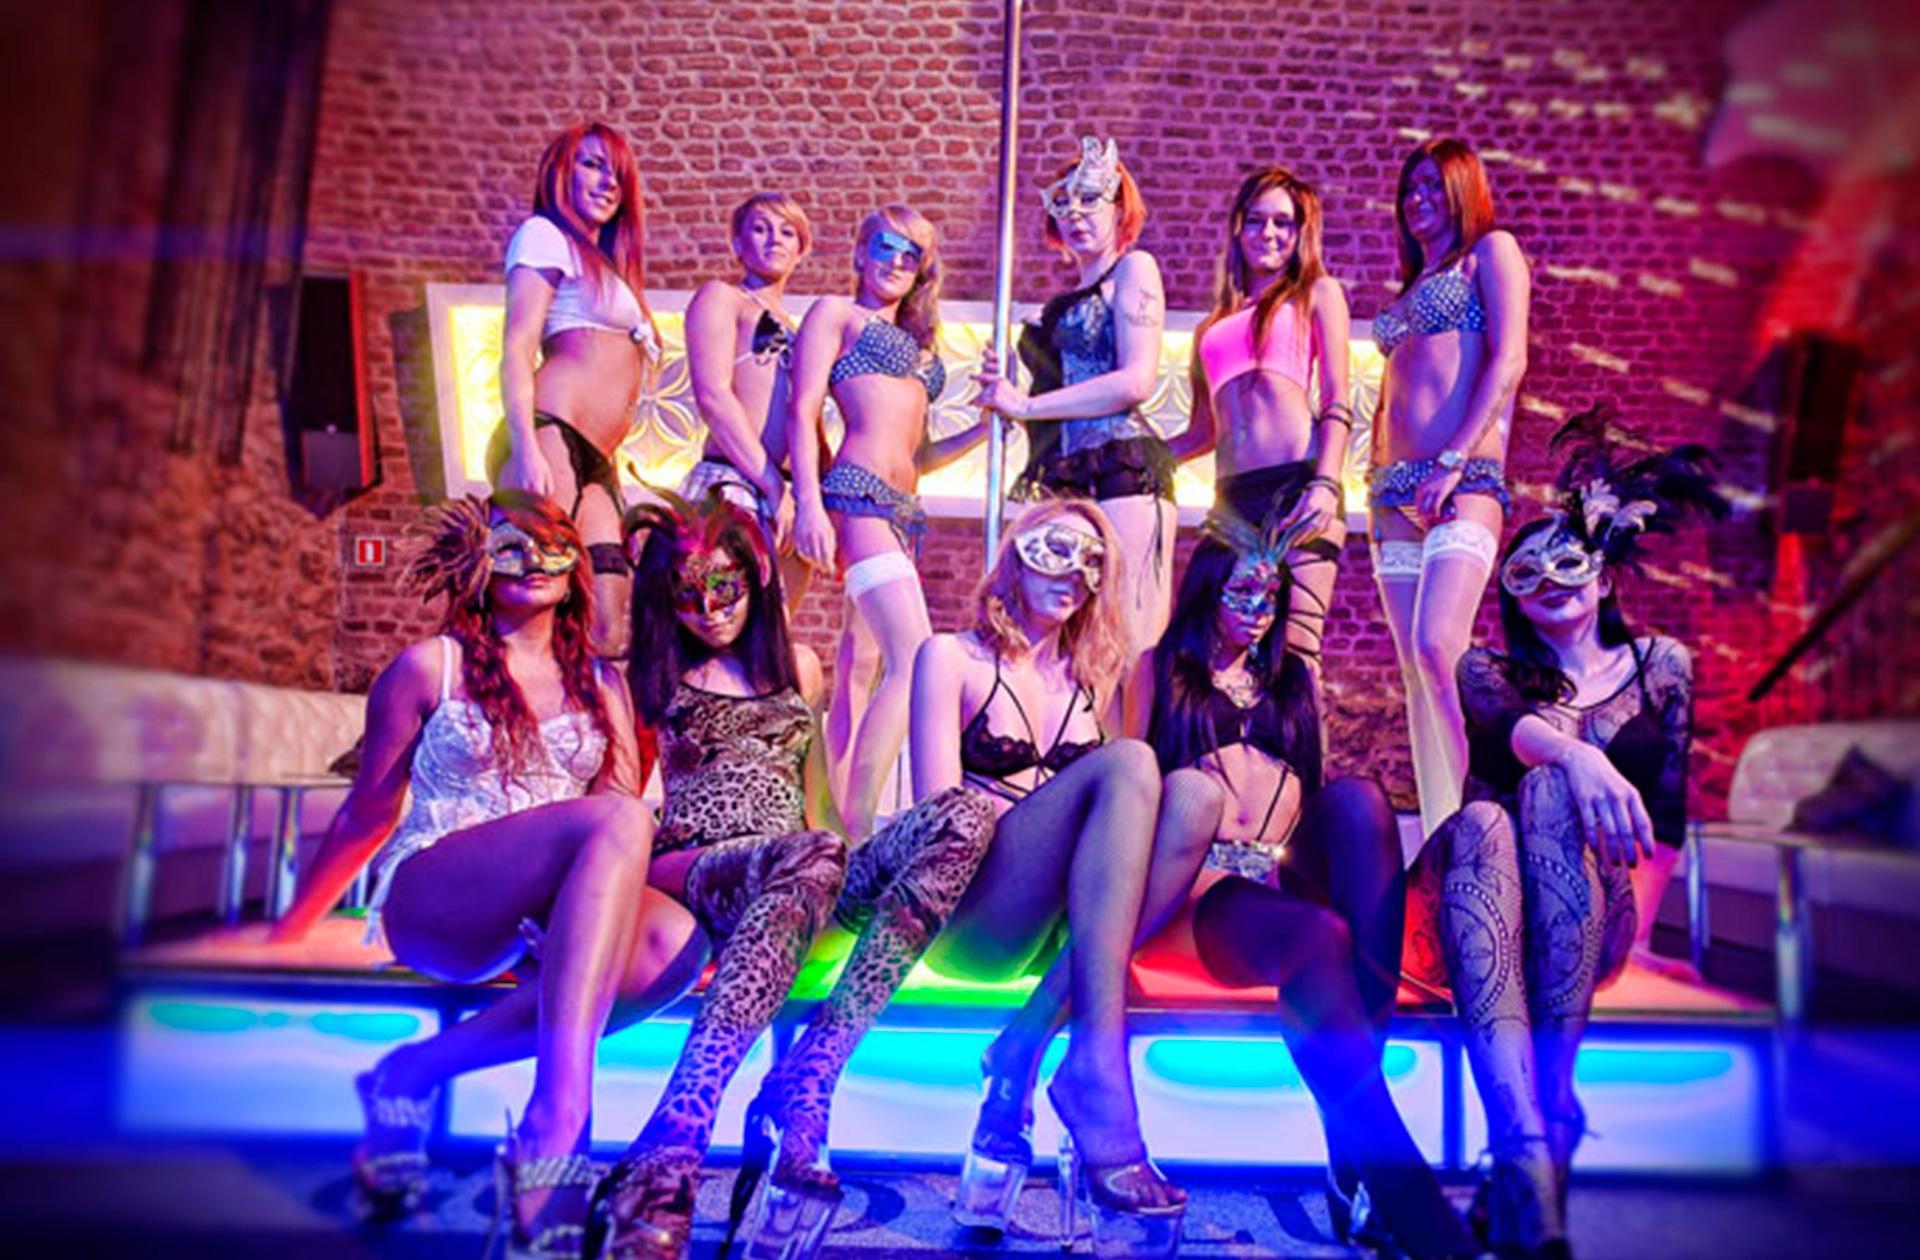 Strip clubs in krakow